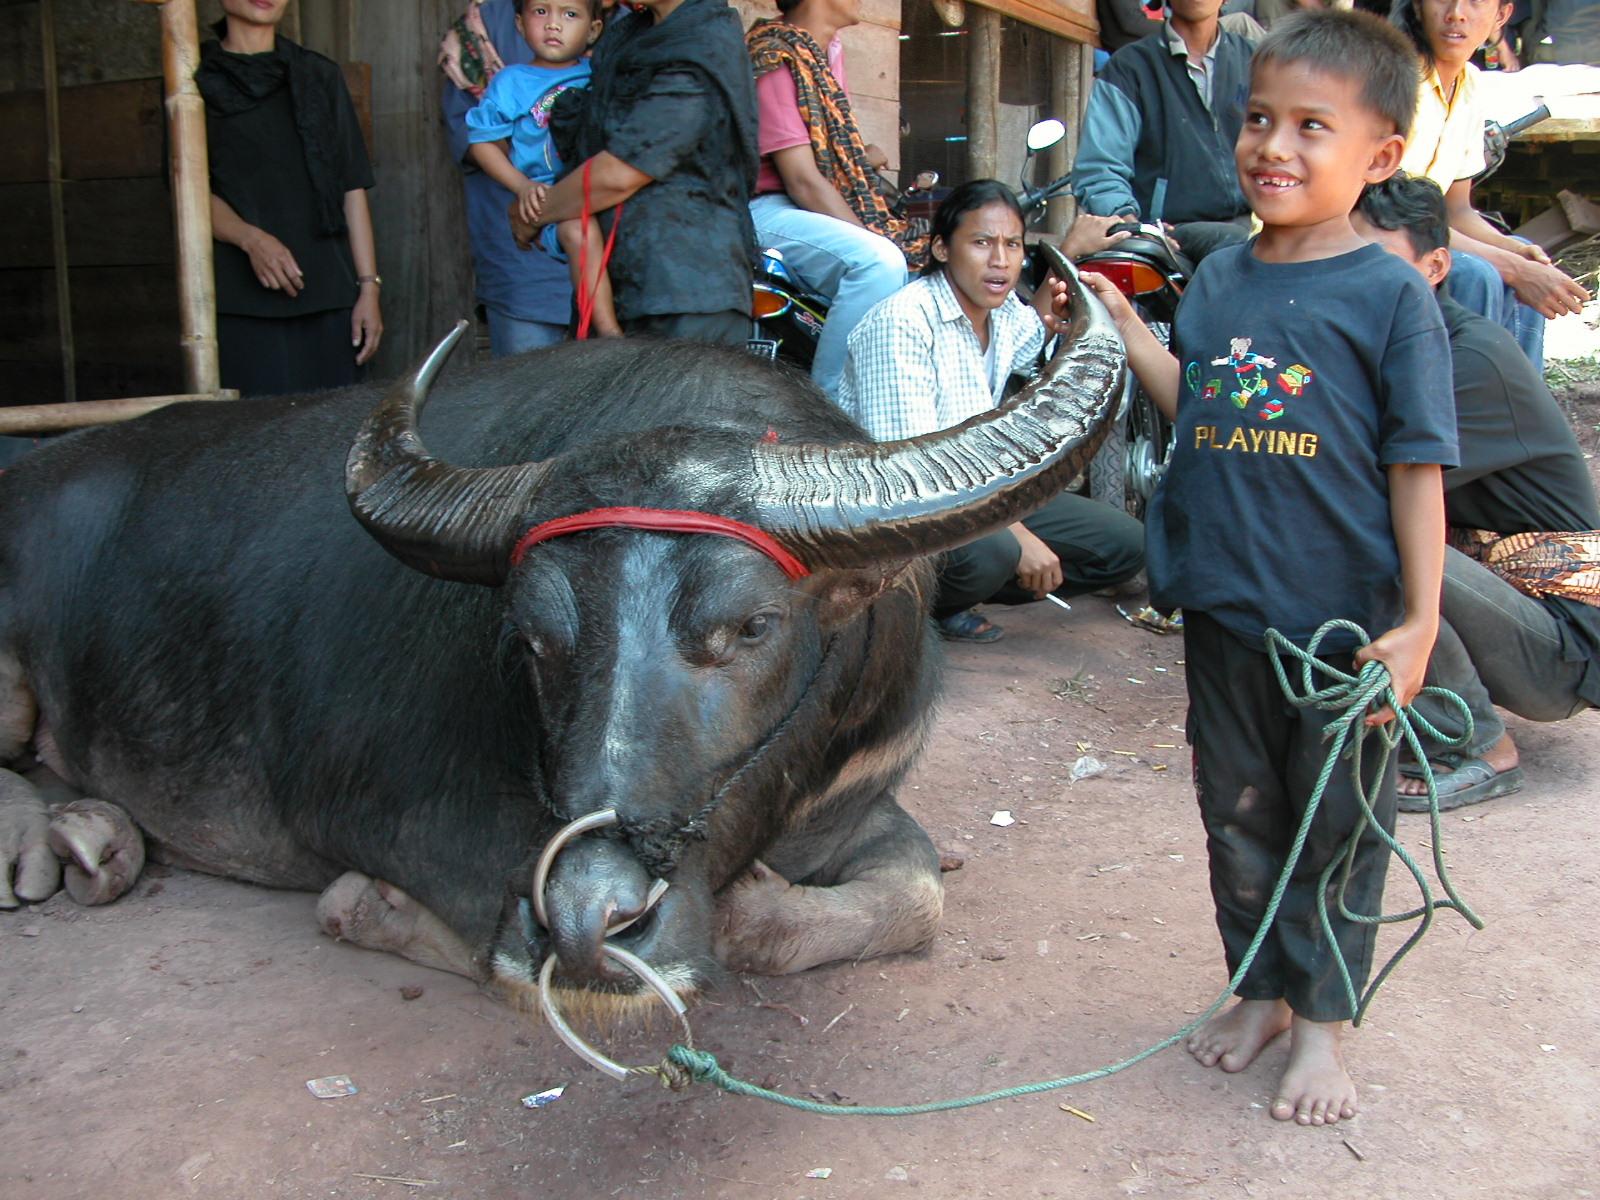 Indonesië, omgeving van Rantepao - begrafenisfeest, Sulawesi